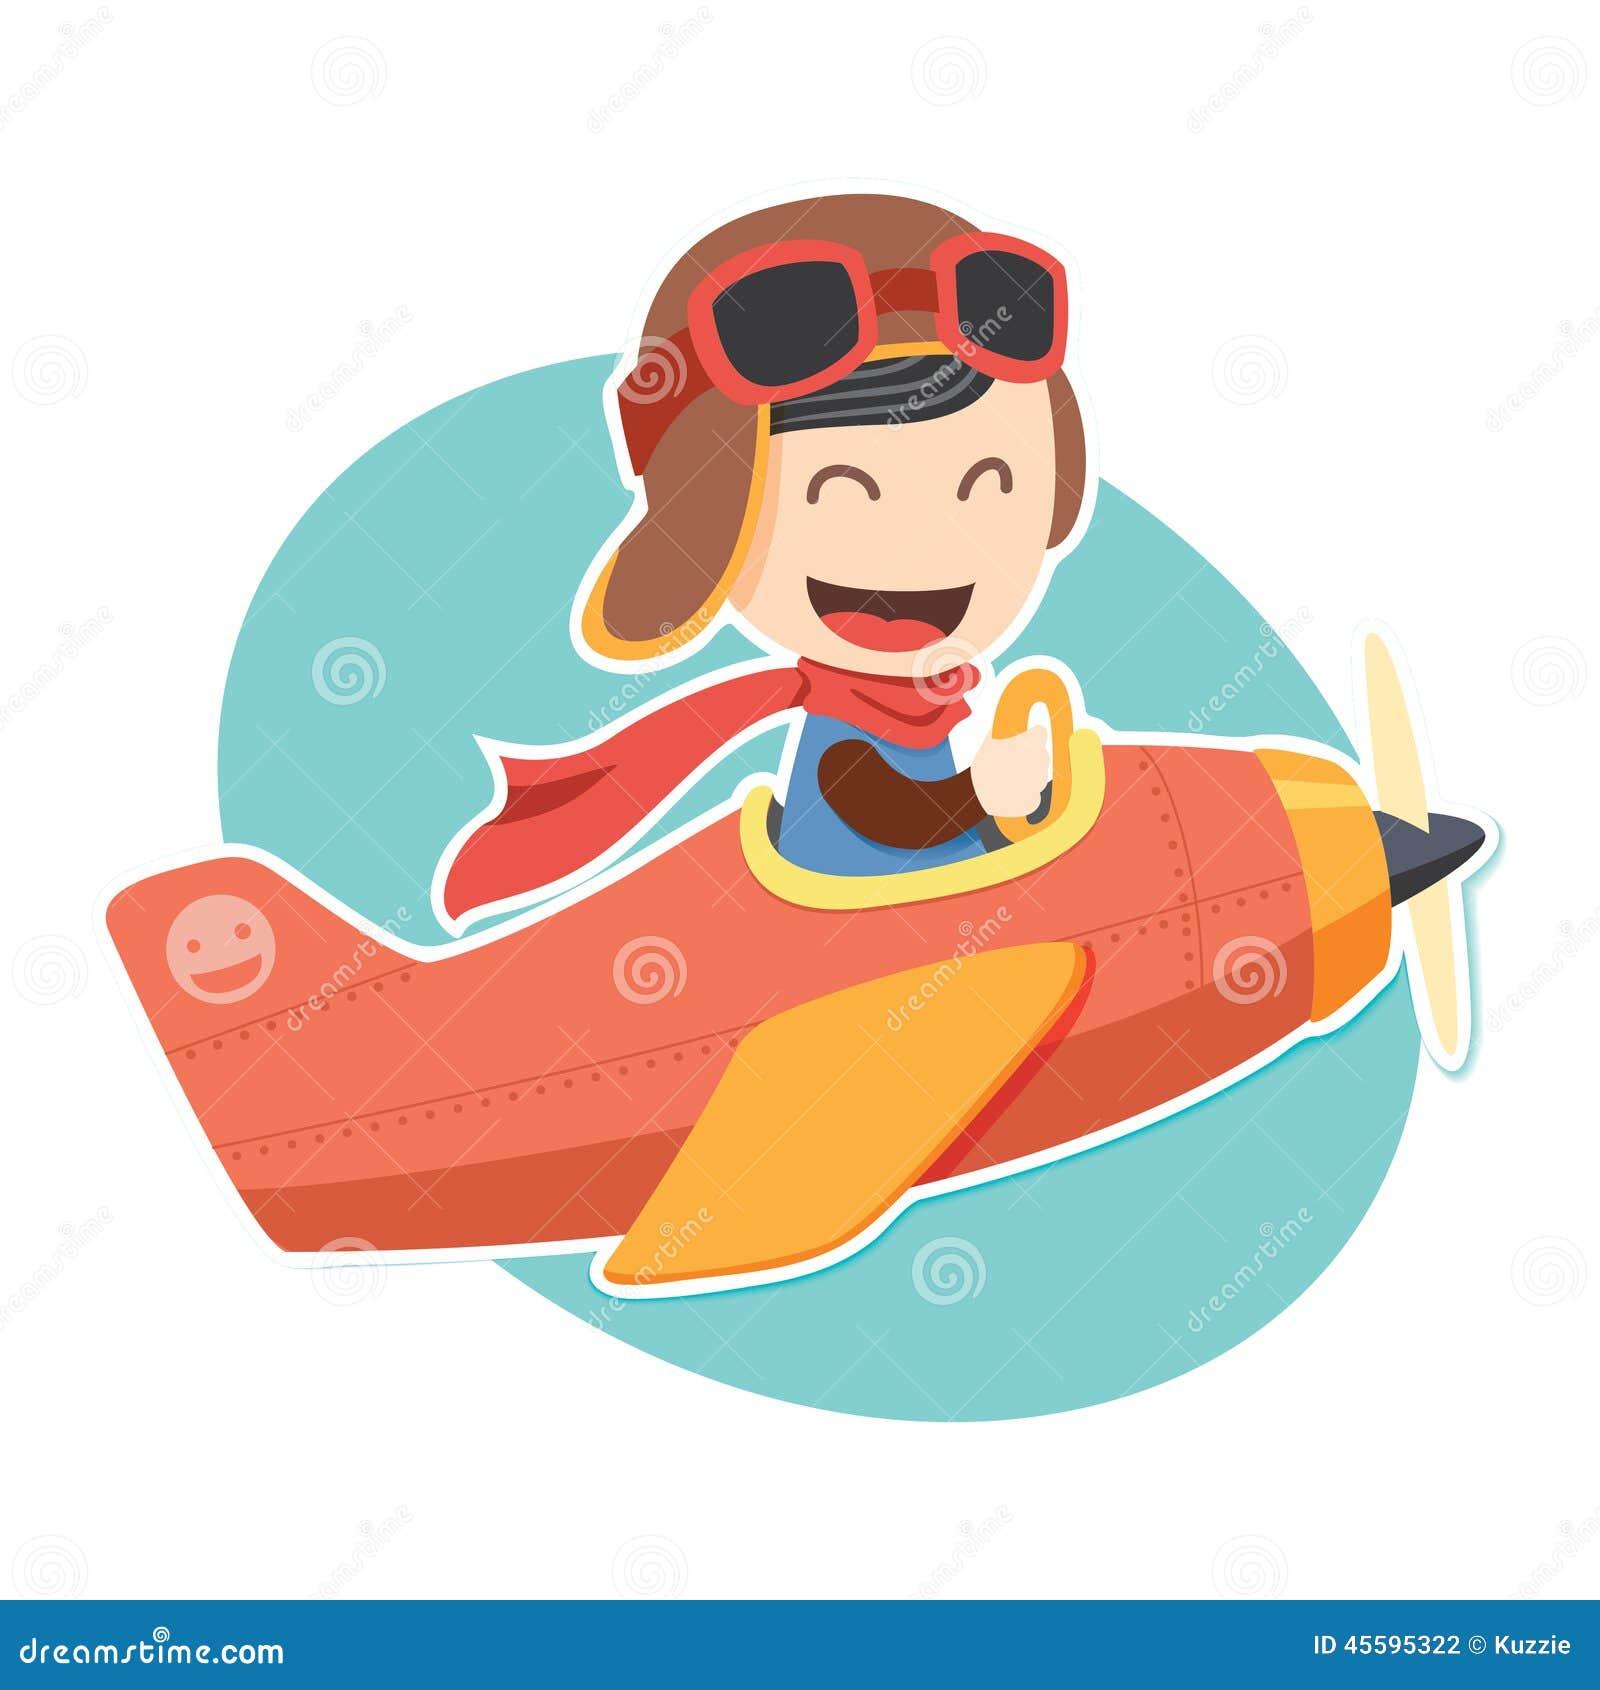 Pilot Boy Sticker Stock Vector - Image: 45595322